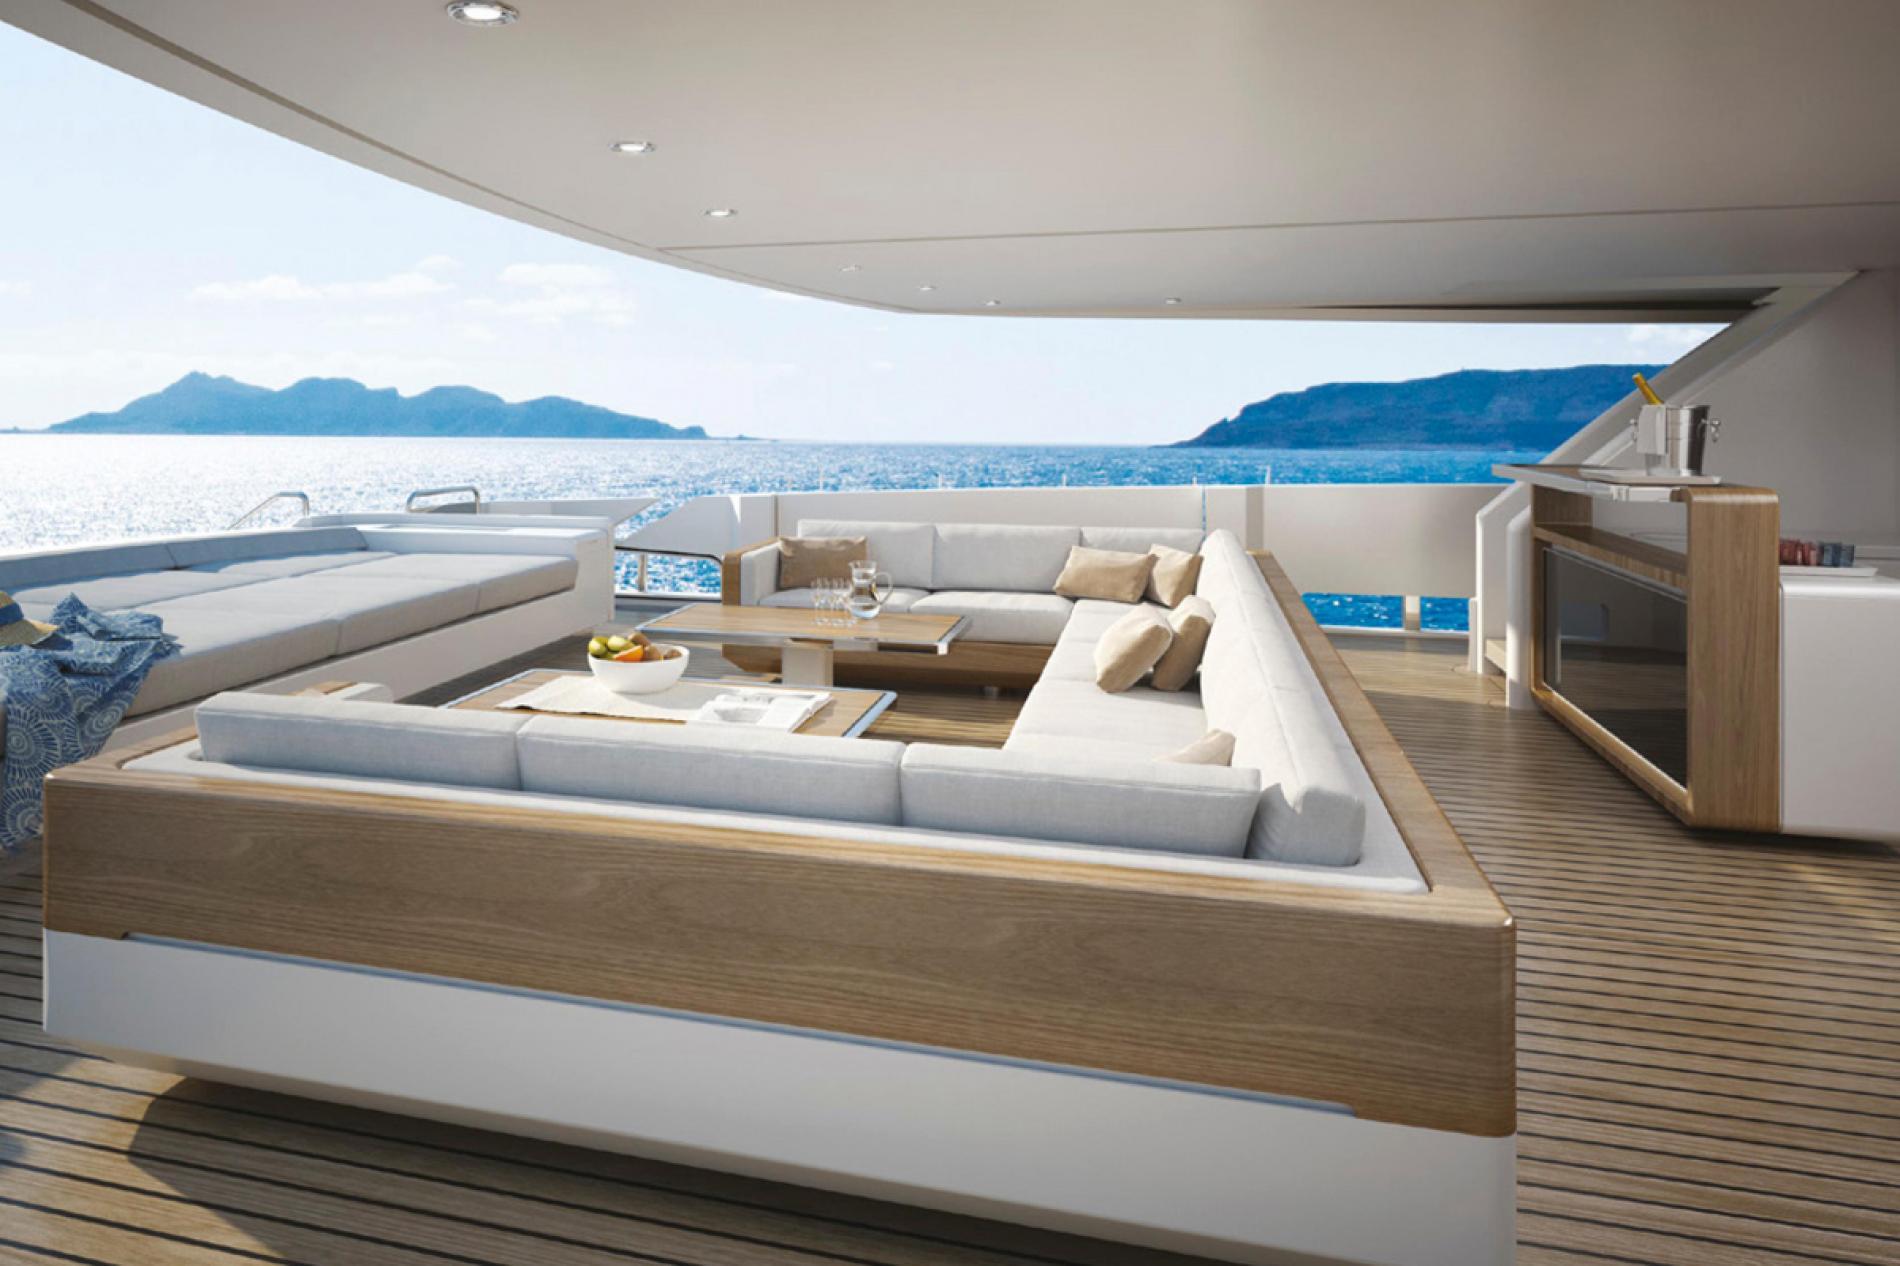 TANKOA S501 #4 - Luxury Motor Yacht For Sale - Exterior Design - Img 1 | C&N